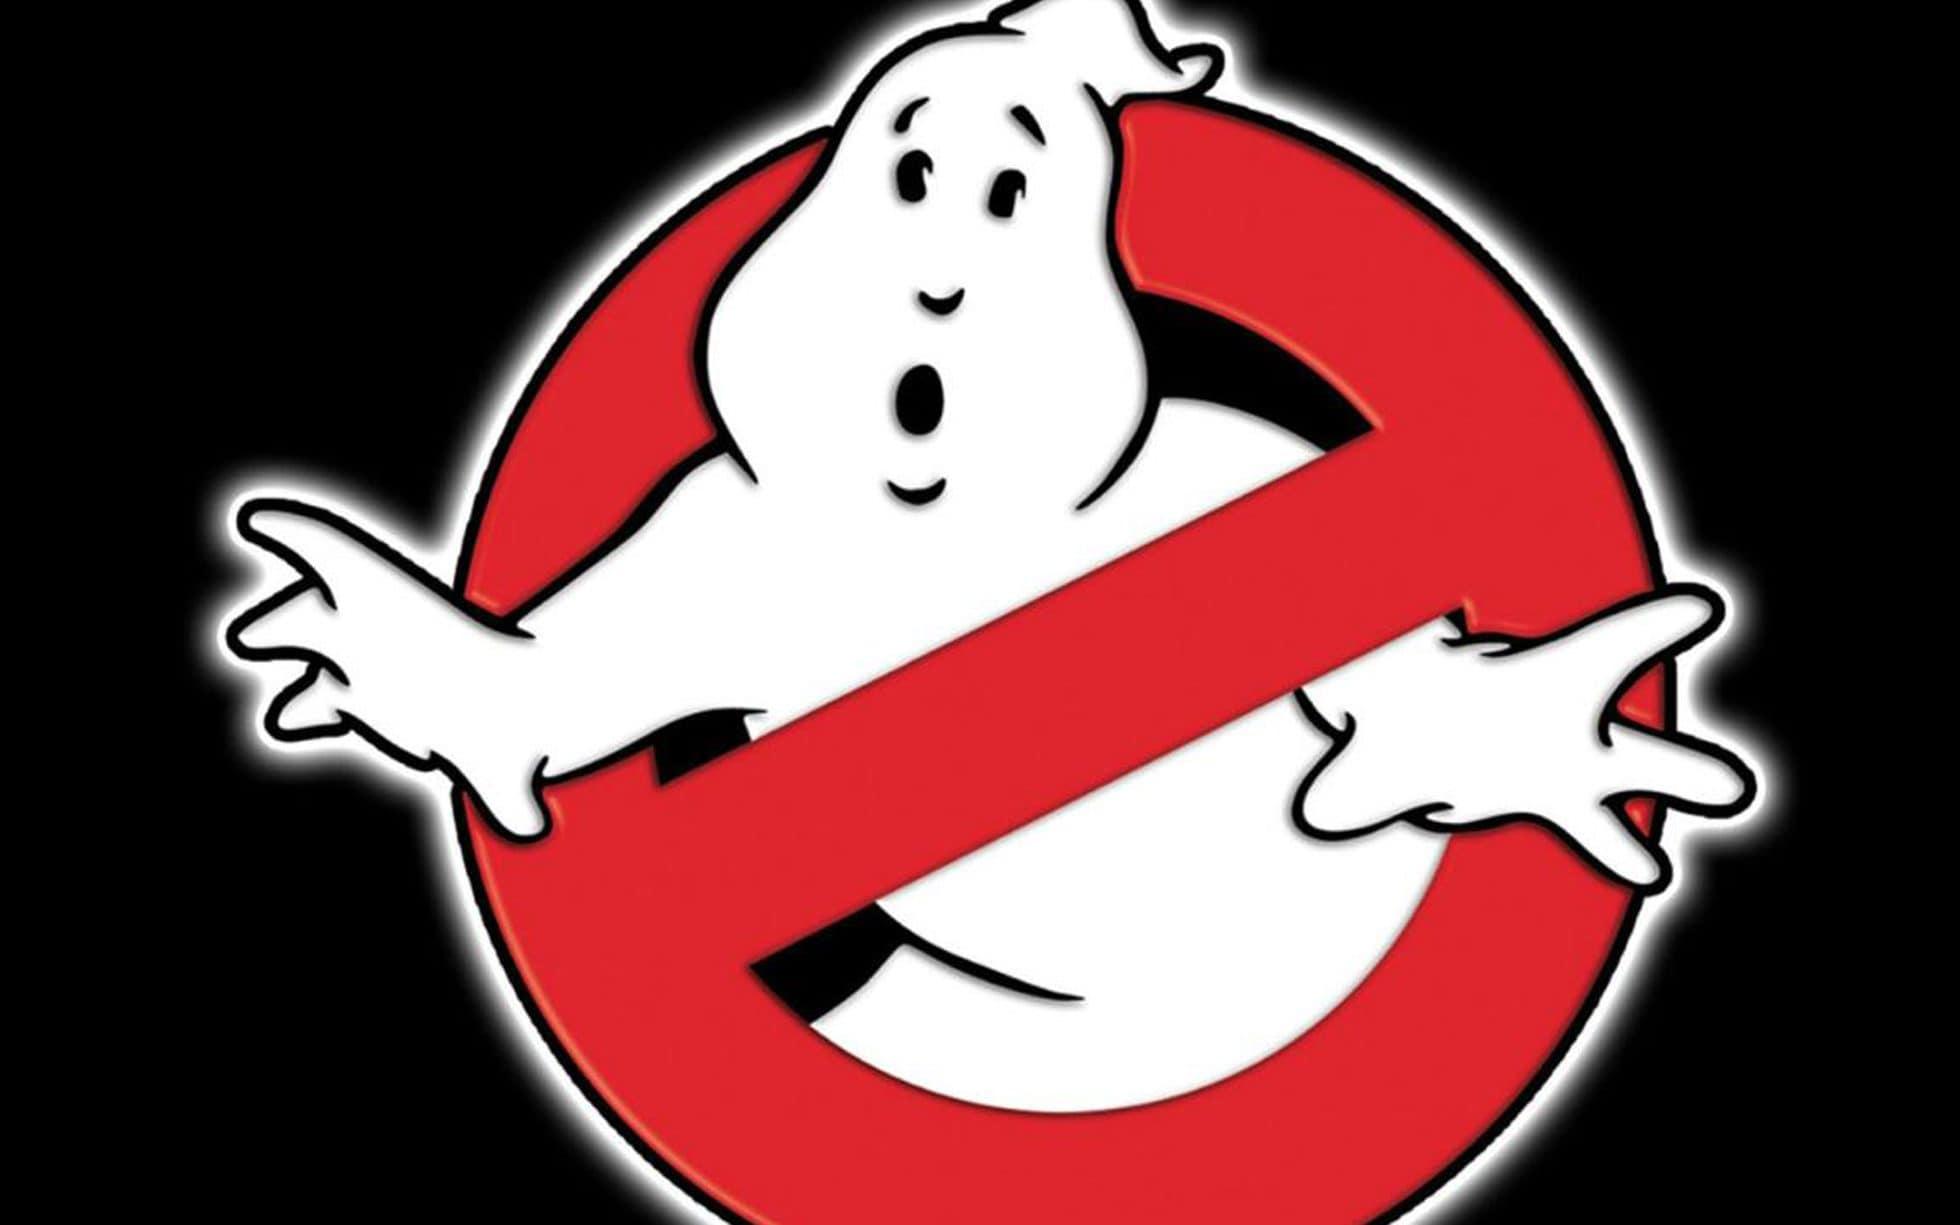 Ghostbusters-logo_trans_NvBQzQNjv4Bqeo_i_u9APj8RuoebjoAHt0k9u7HhRJvuo-ZLenGRumA.jpg